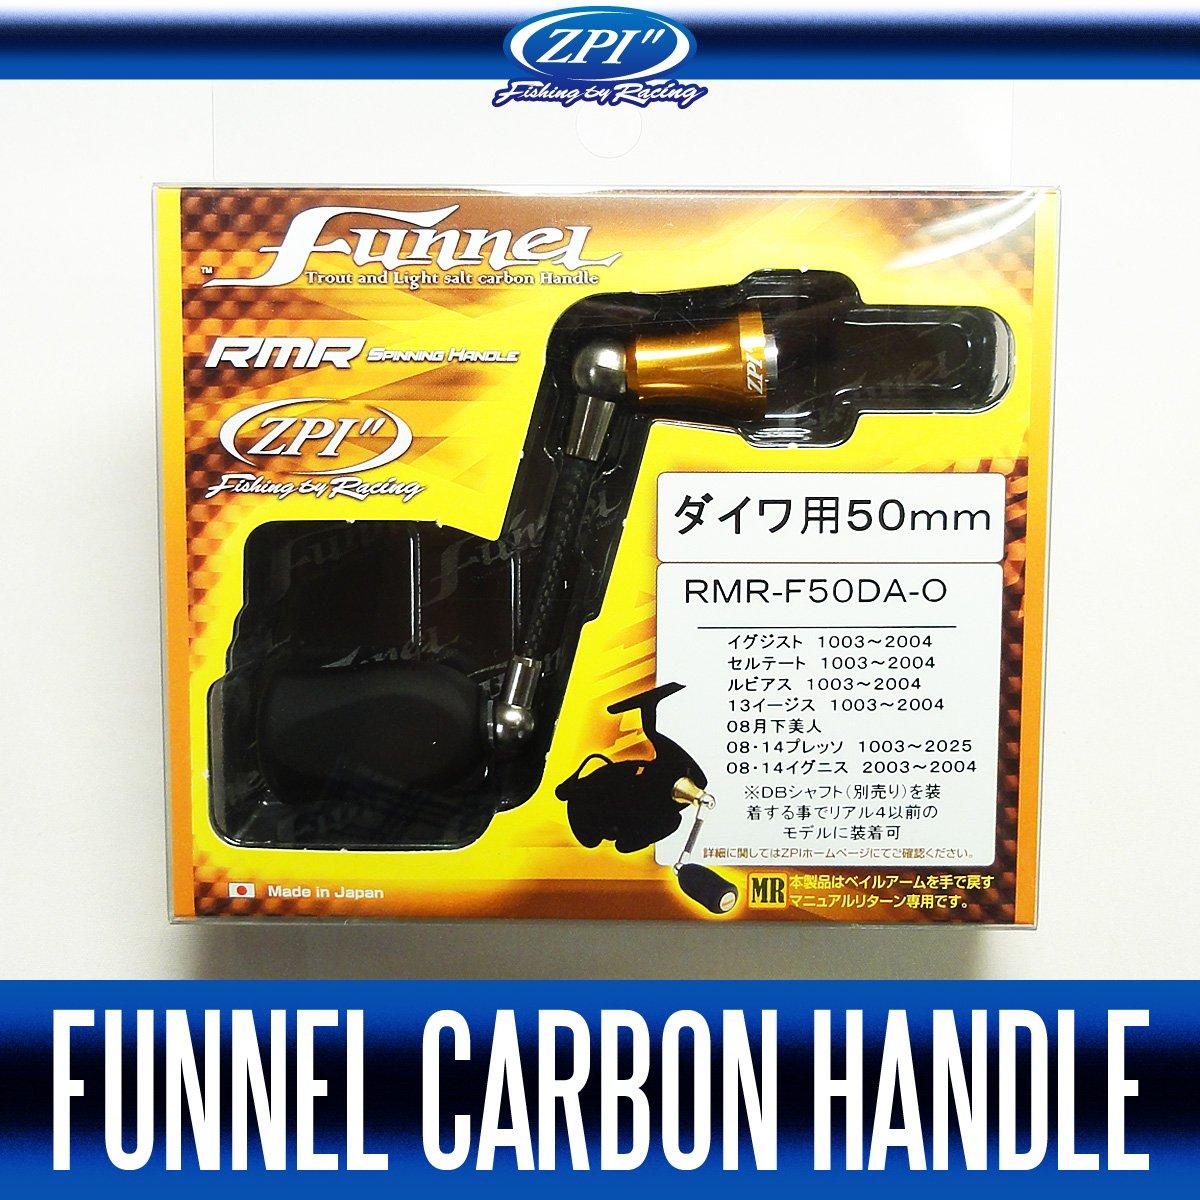 【ZPI】 ファンネル 50mm ダイワ用 オレンジ (スピニングカーボンハンドル:RMR-F50DA-O)   B011TBUJFY